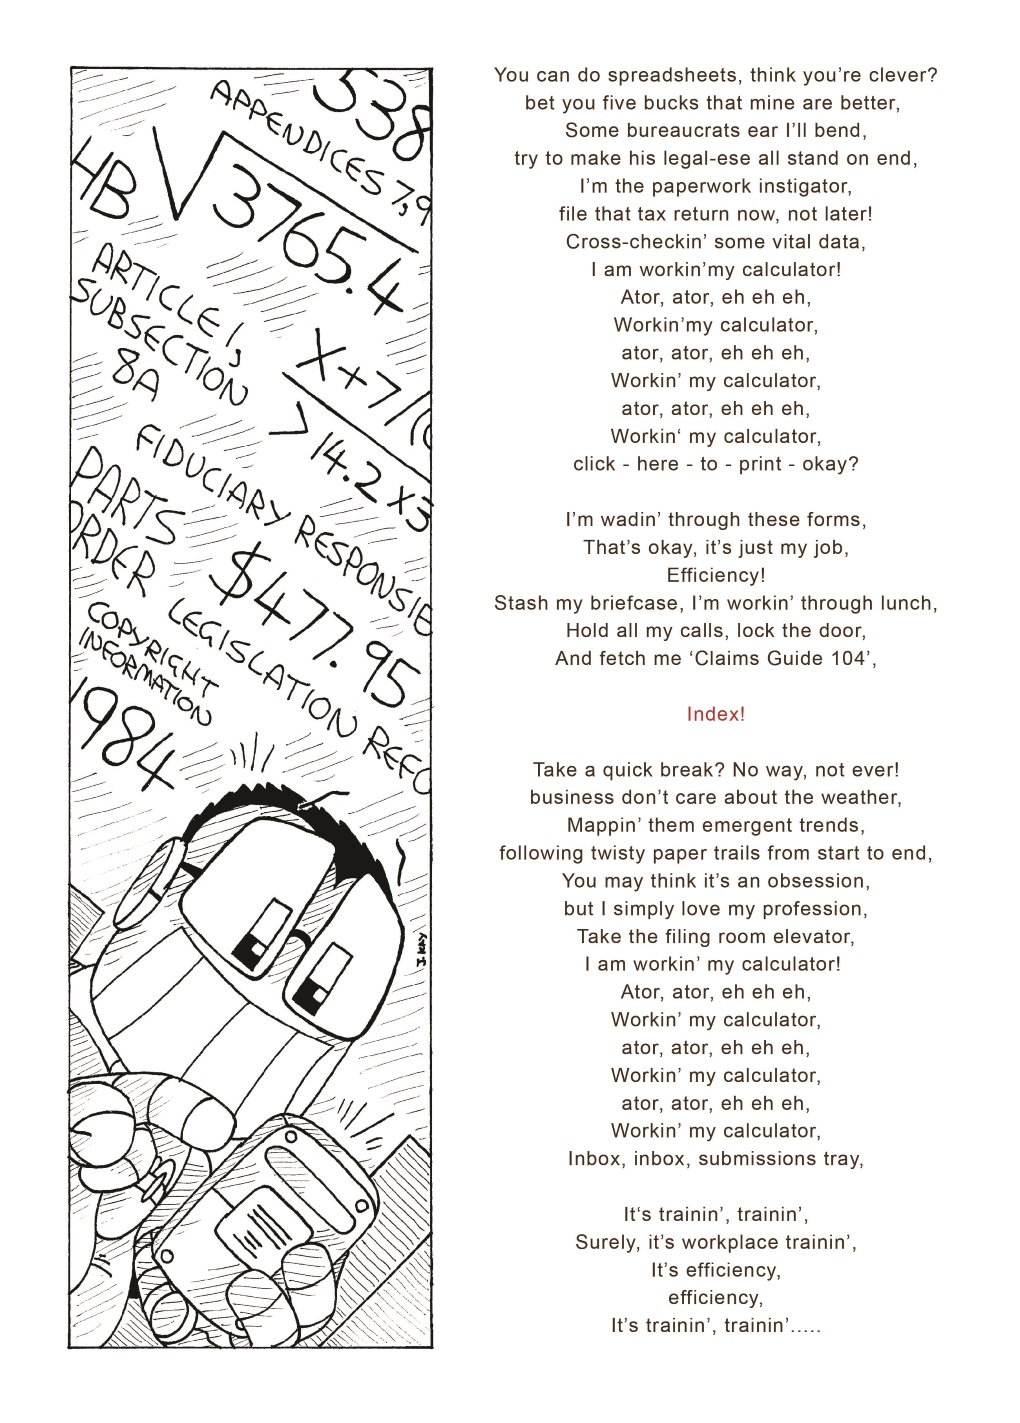 Filksong fiesta: Pocket Protector sings 'Calculator' (2 of 2)